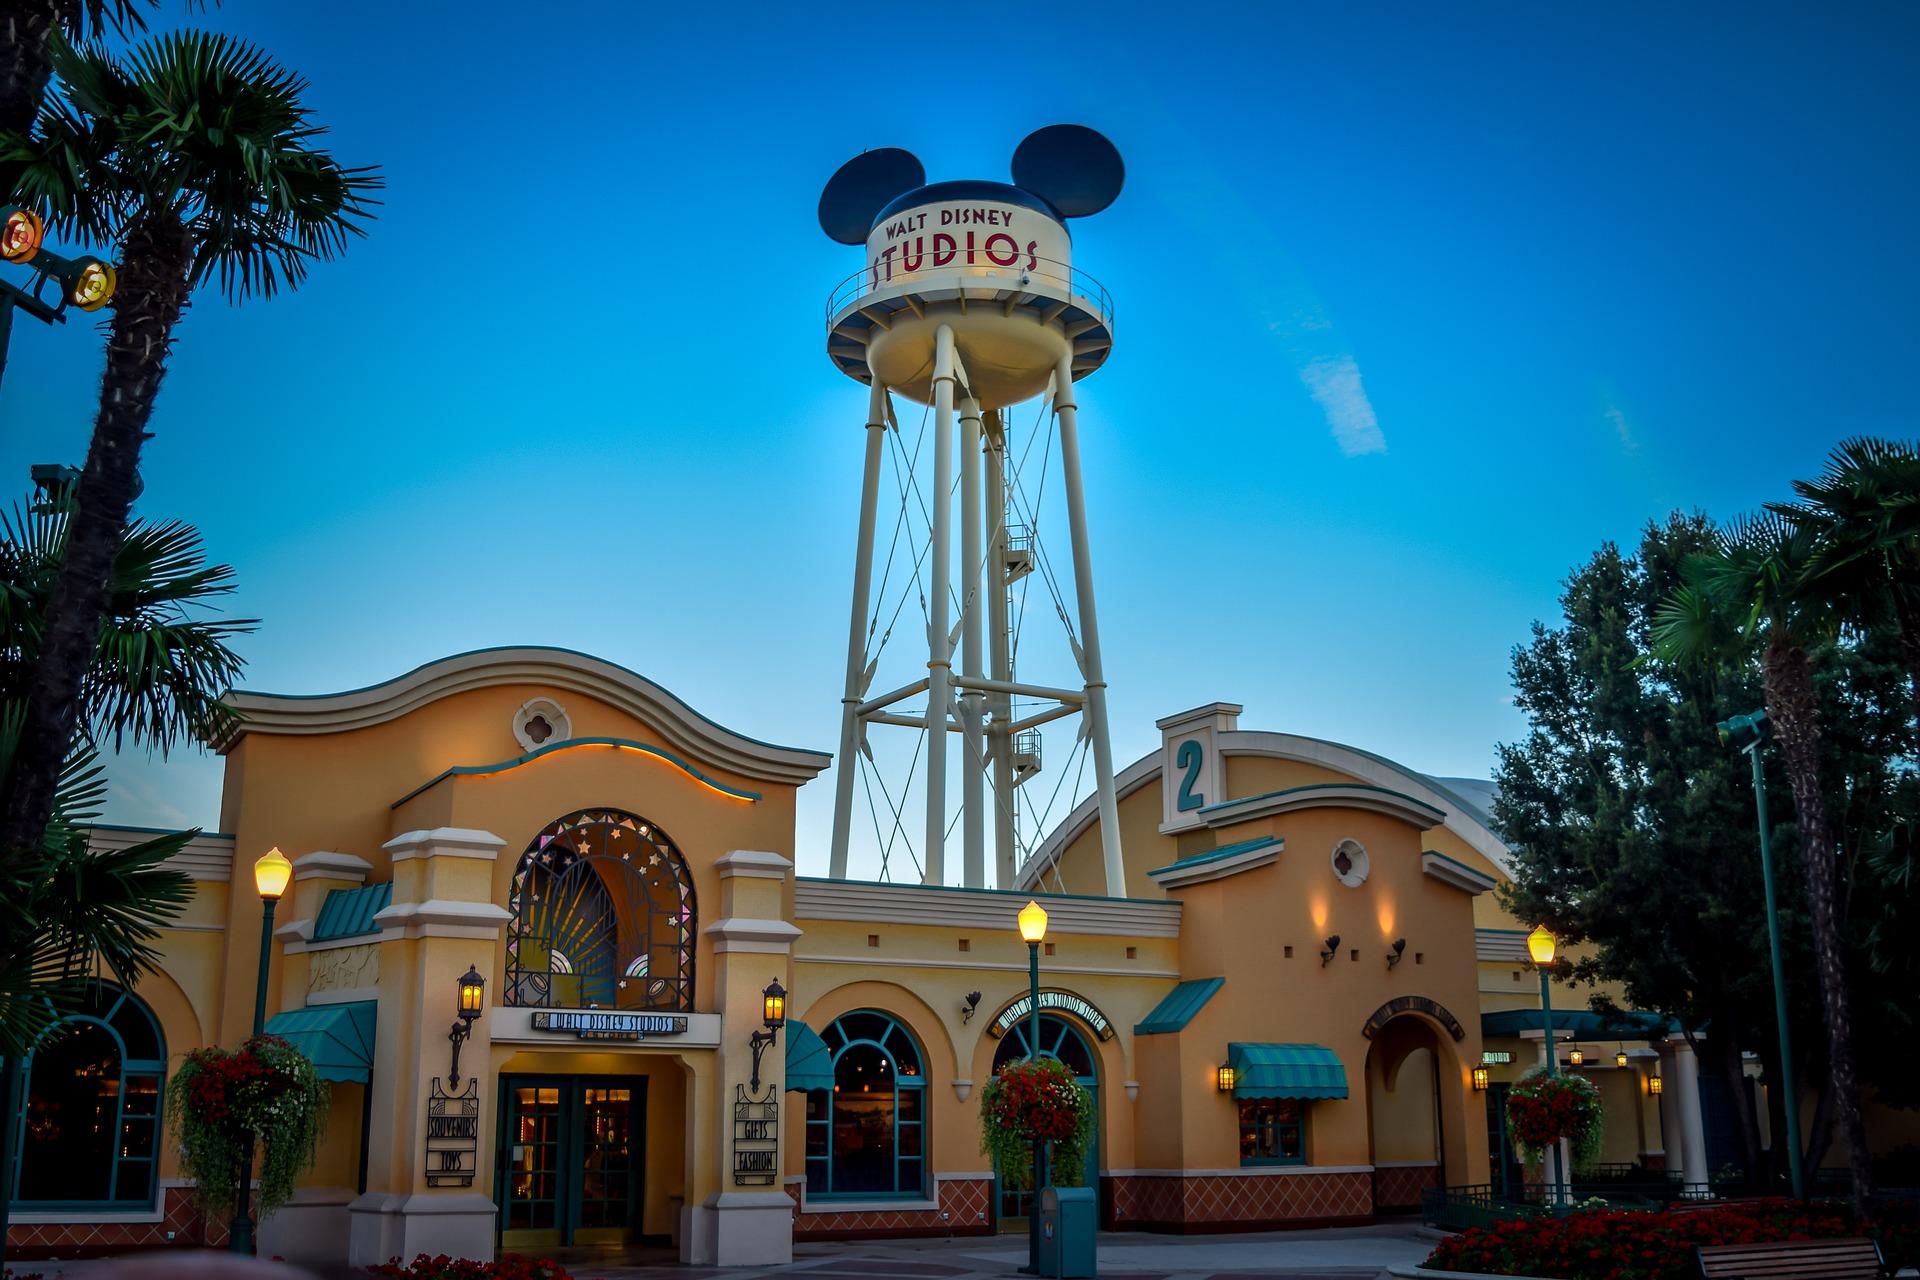 DisneyLand Movie Studiios Park